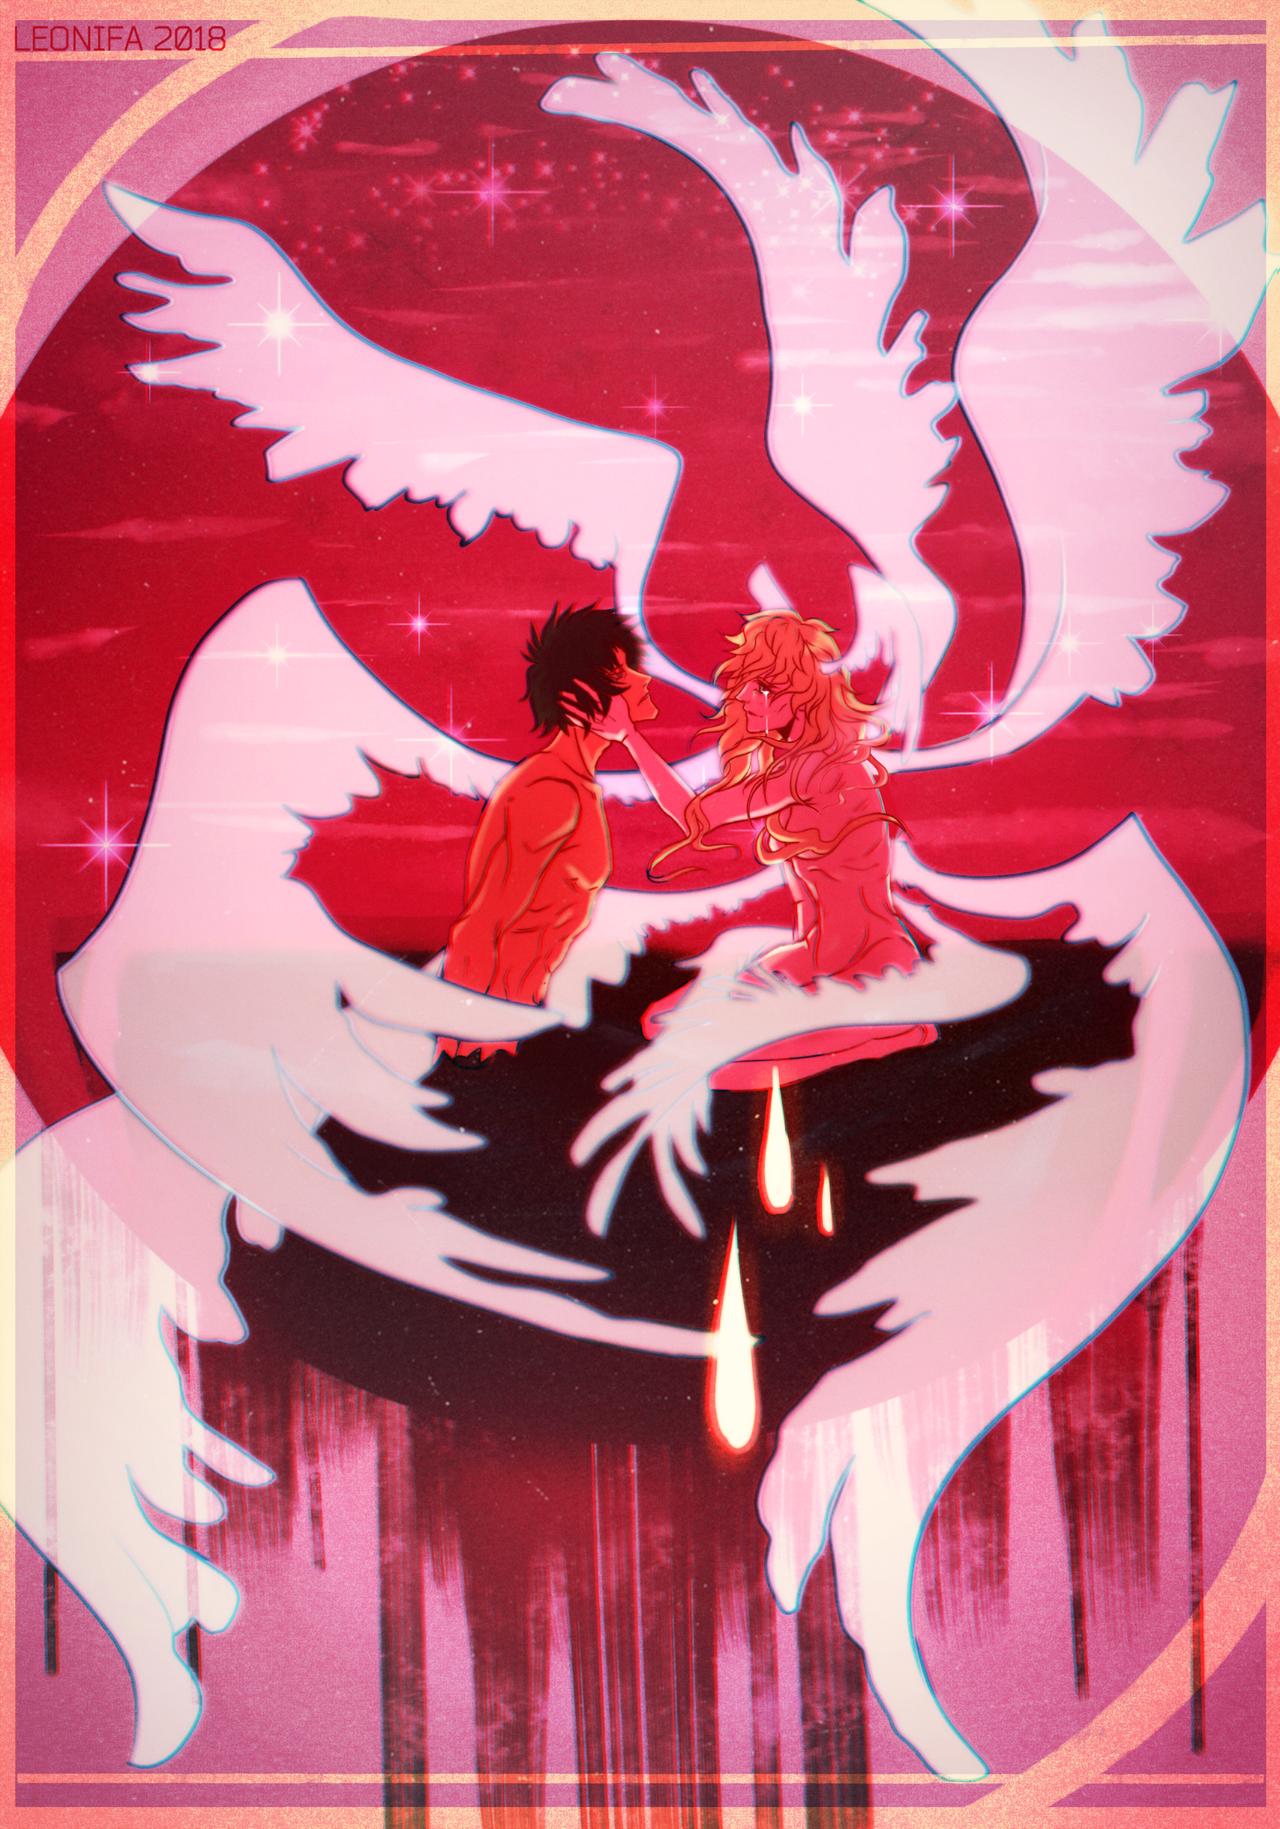 Pin by Sugarfree Pepsi on Devilman crybaby Anime